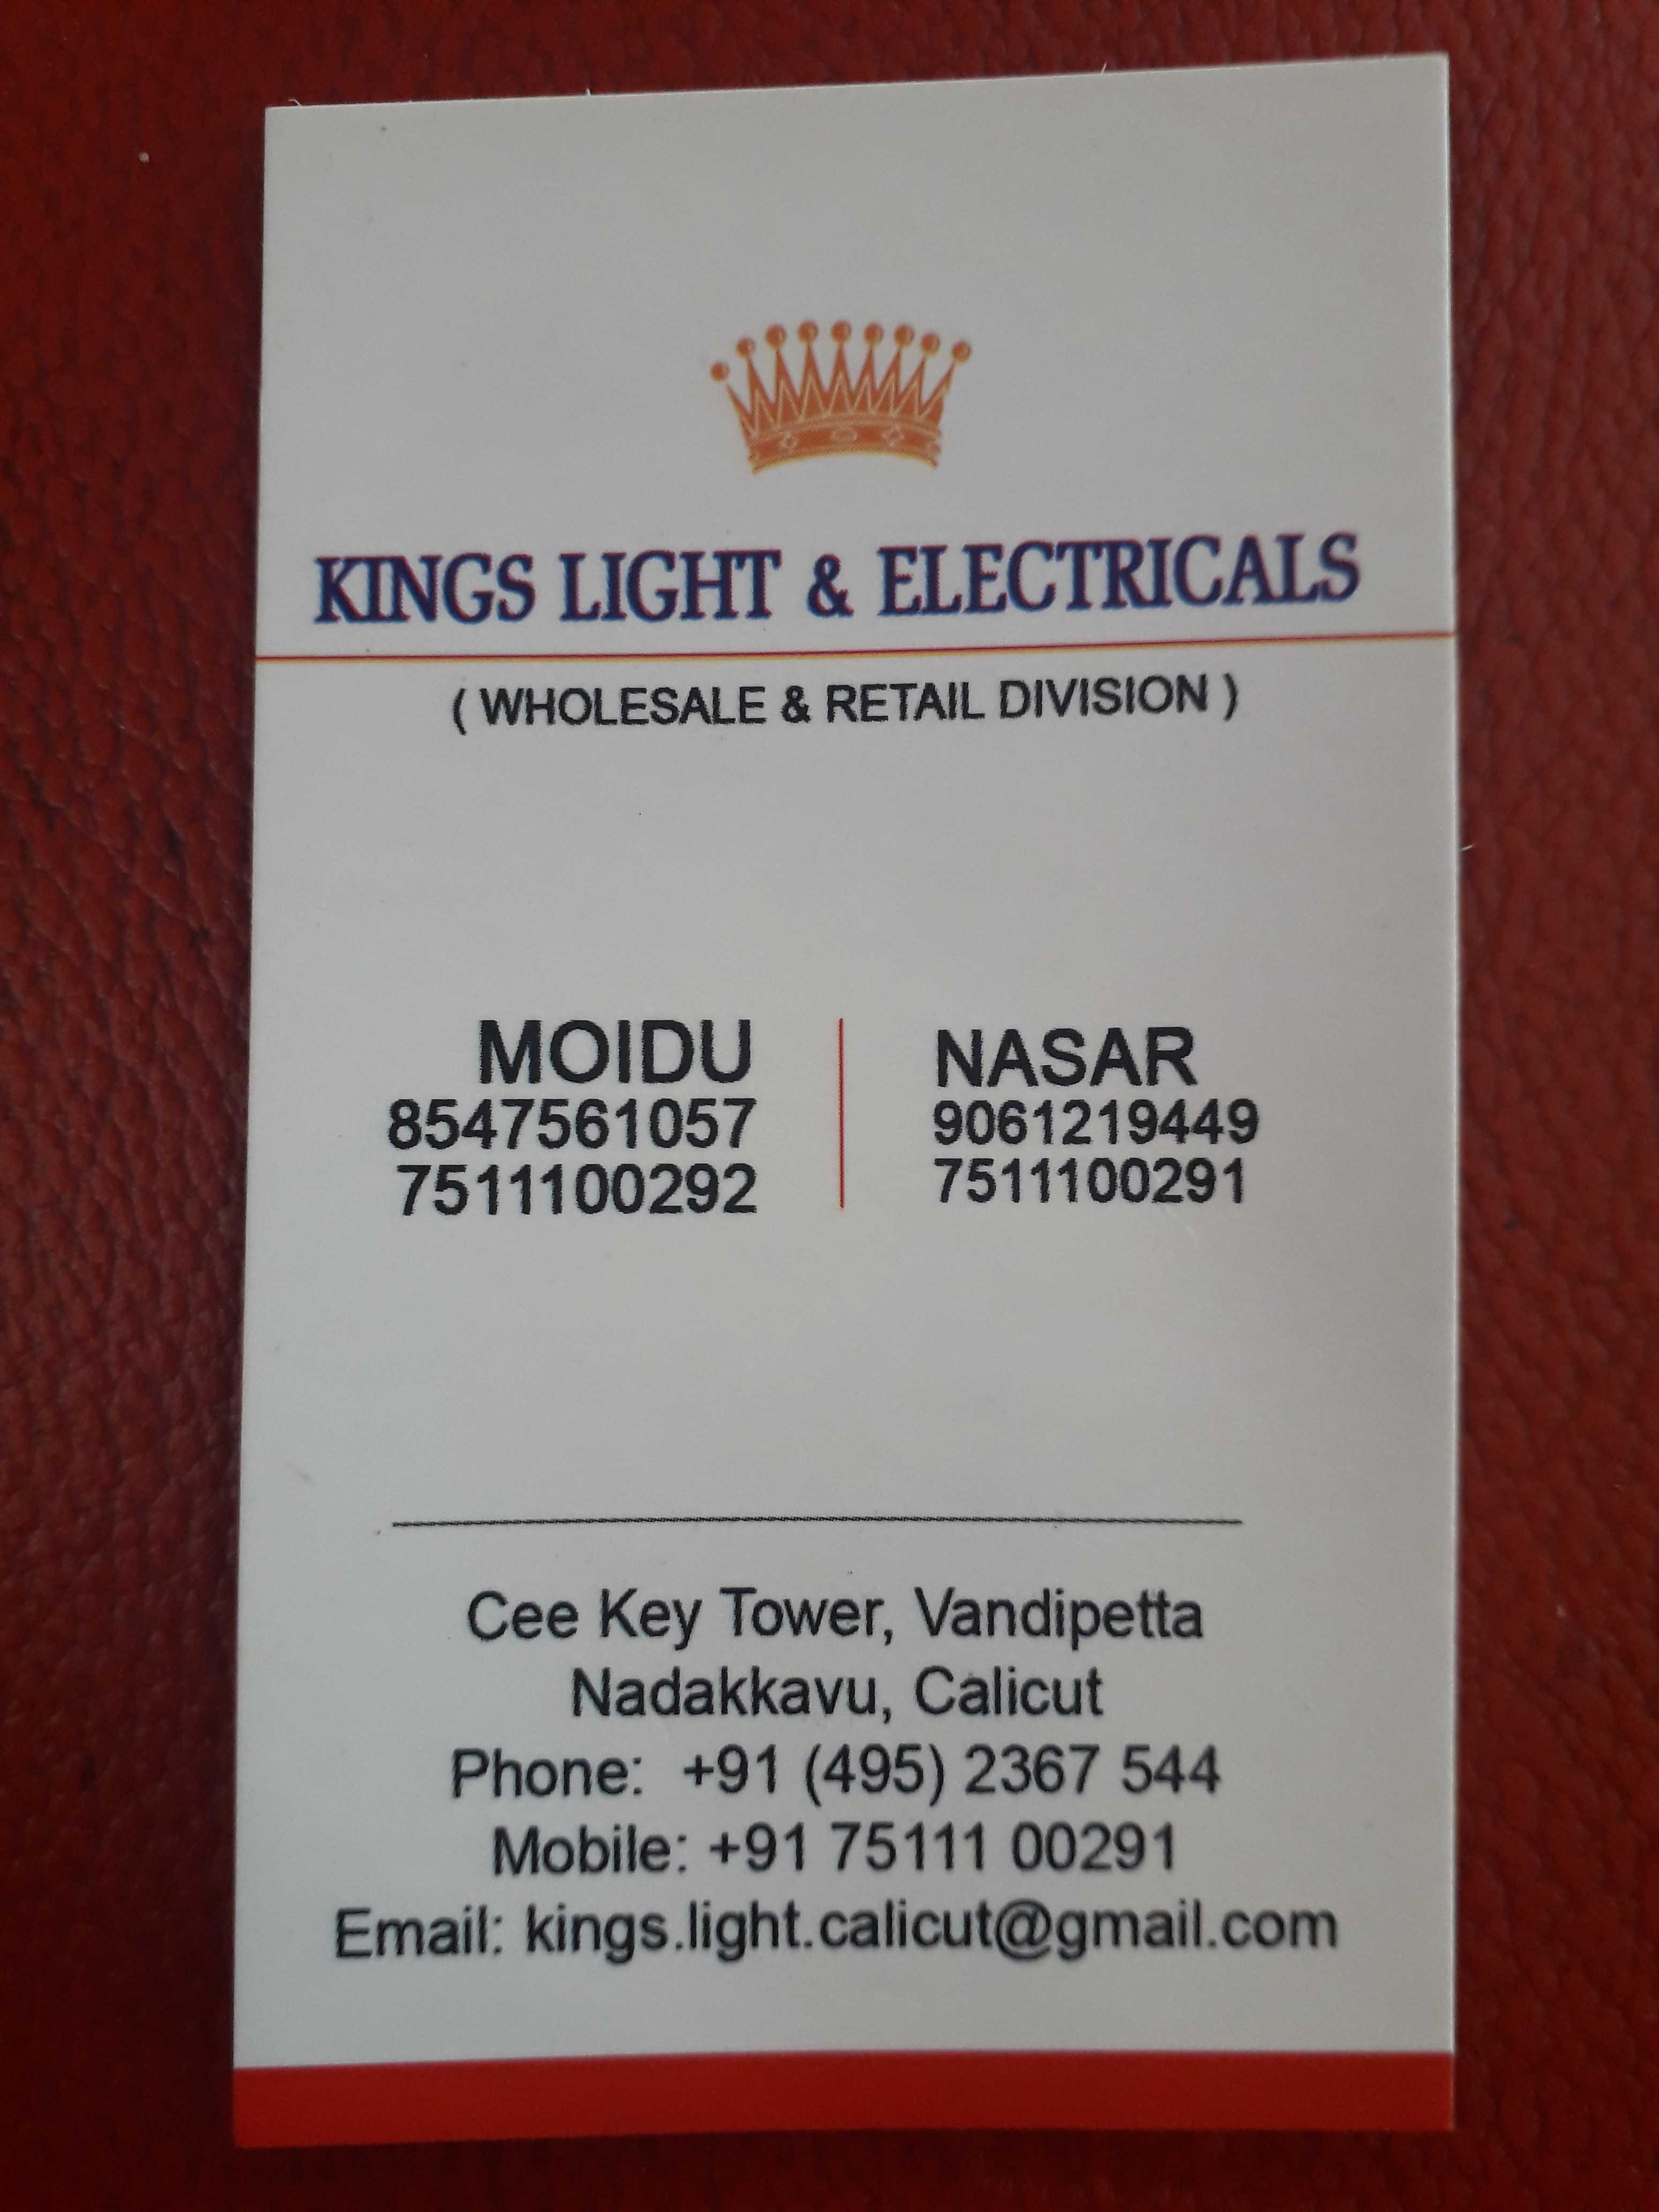 KINGS LIGHT & ELECTRICALS, LIGHT,  service in Nadakkavu, Kozhikode